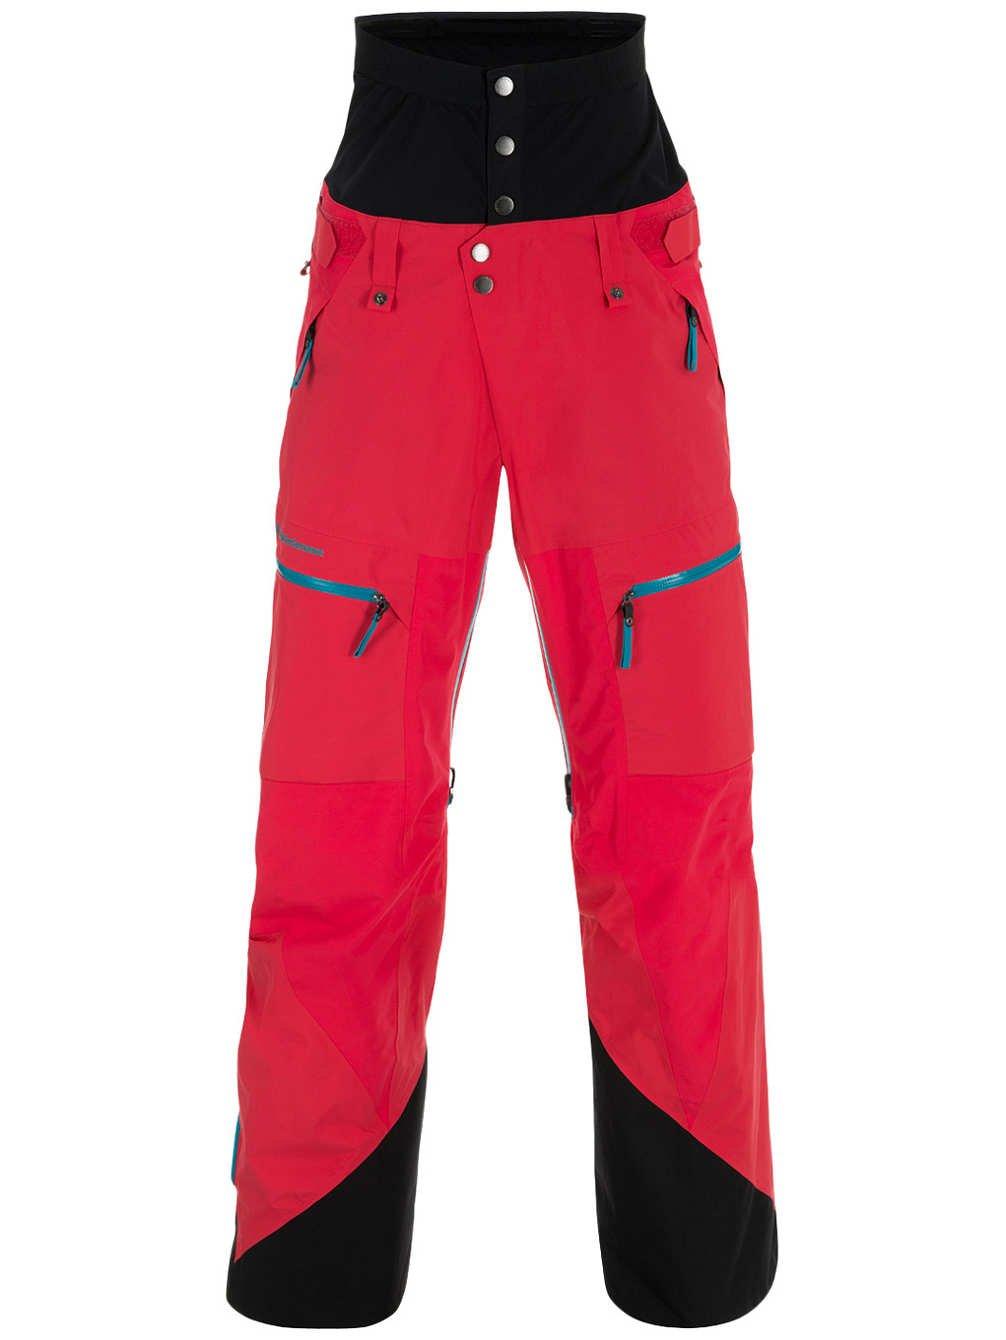 Damen Snowboard Hose Peak Performance Heli 2Layer Vertical Pants